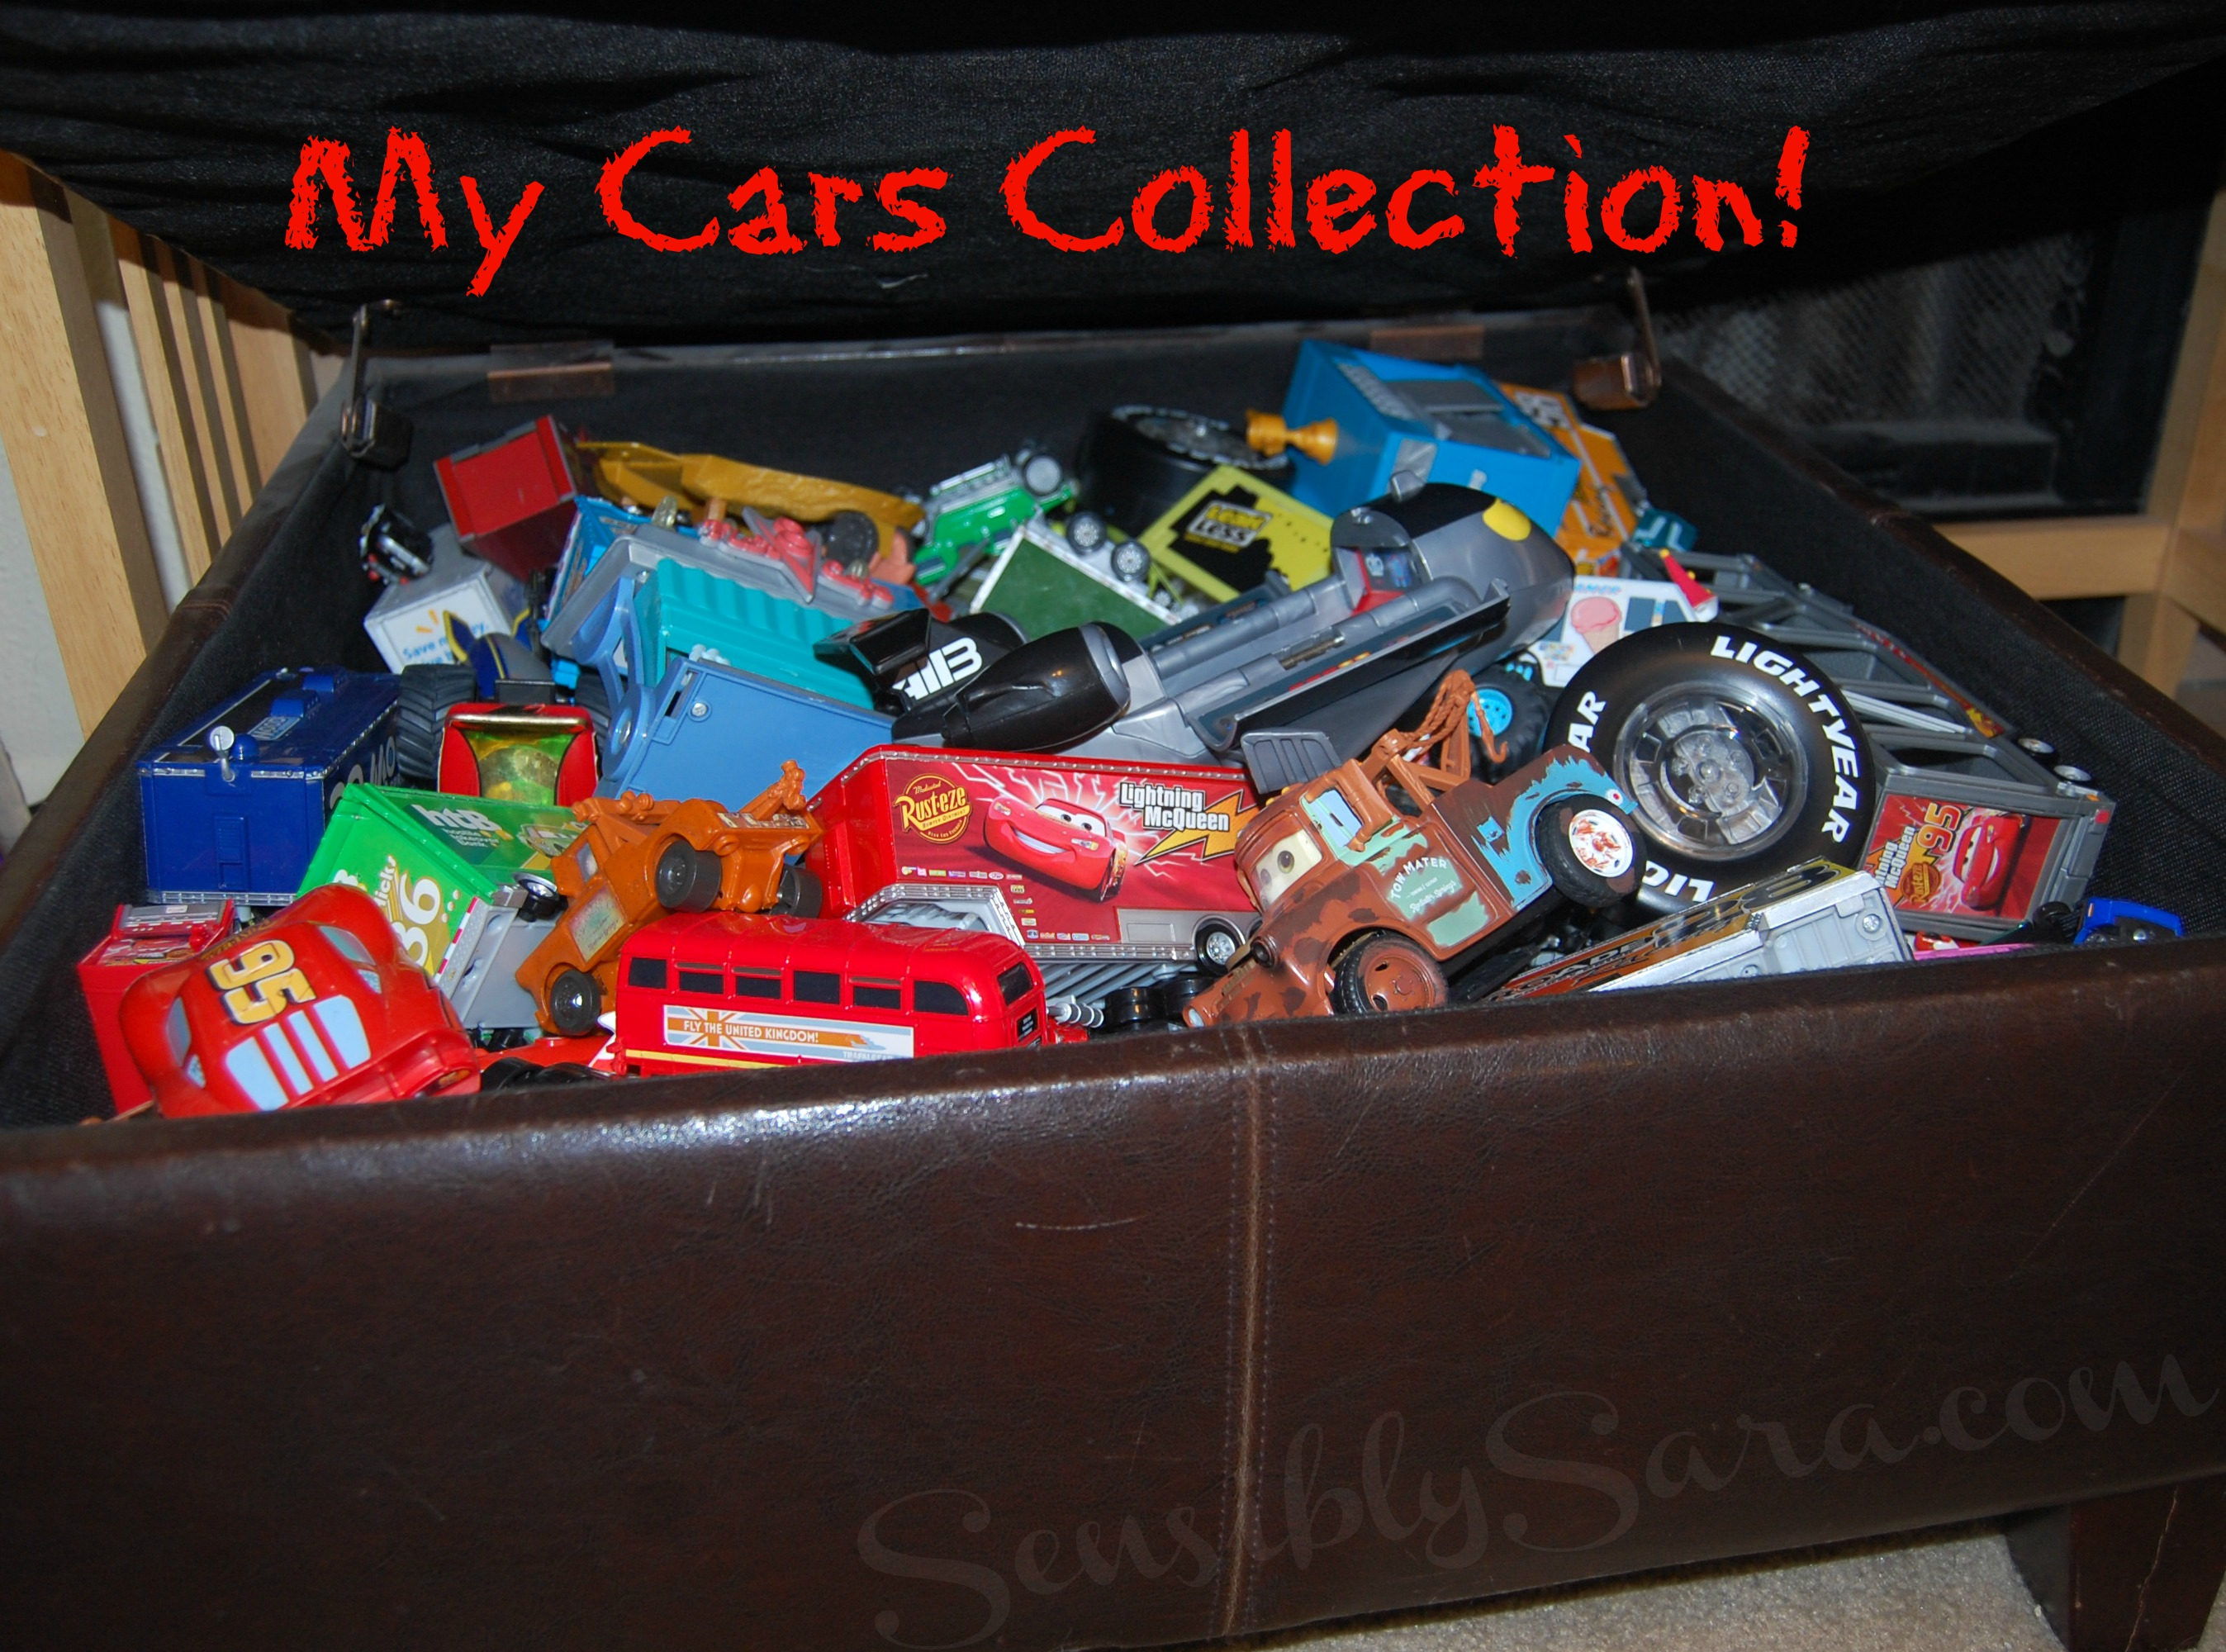 Cars Movie Toys : Disney planes toys at walmart worldofcars cbias shop